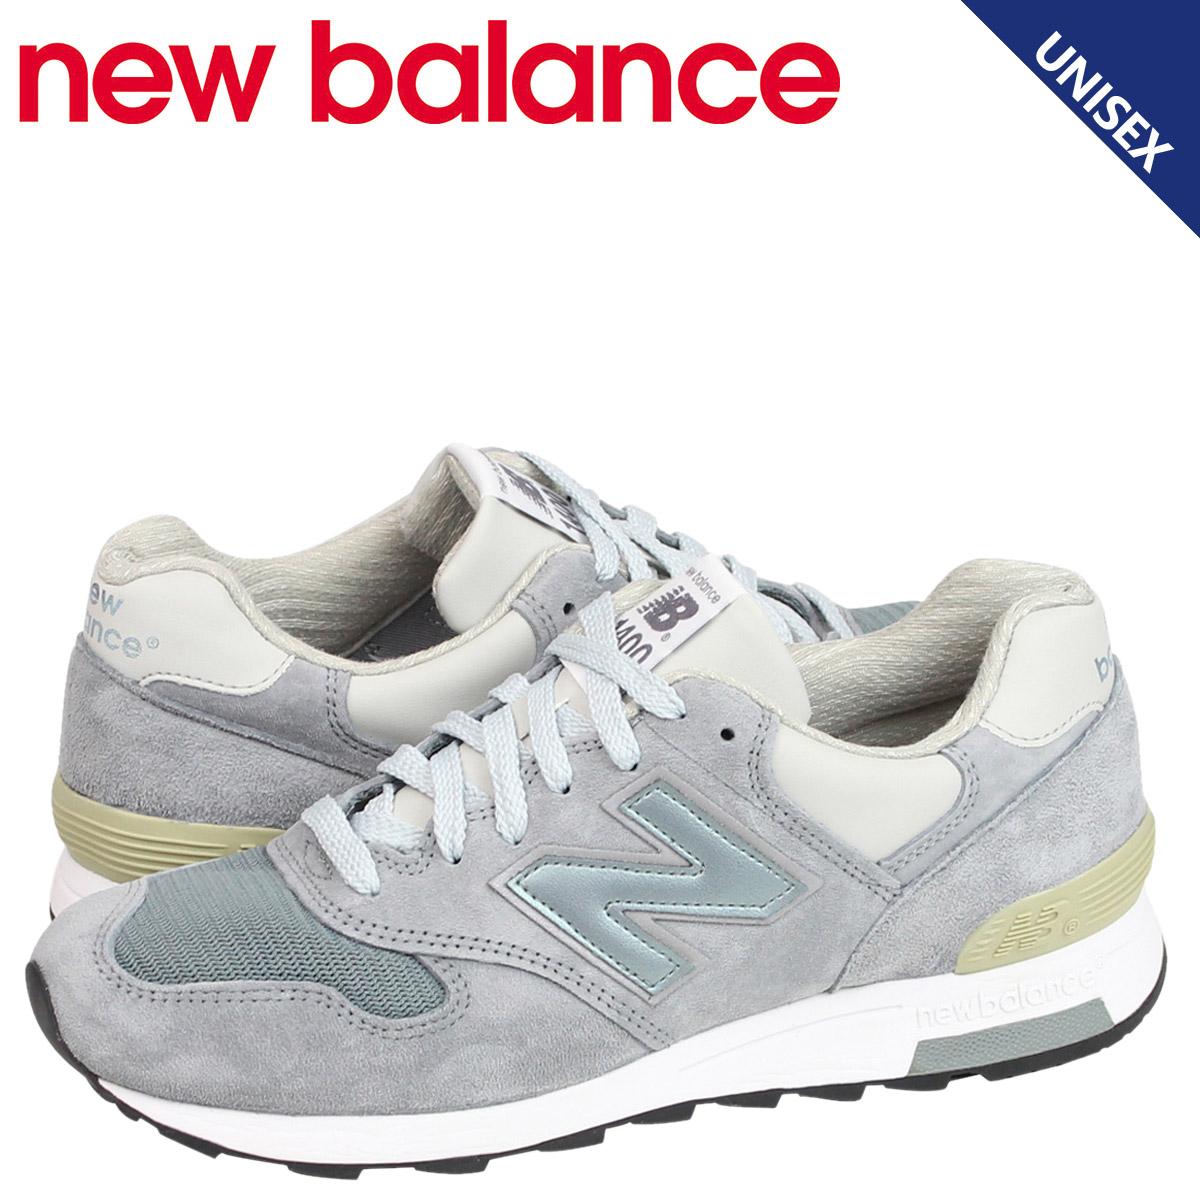 new balance 1400